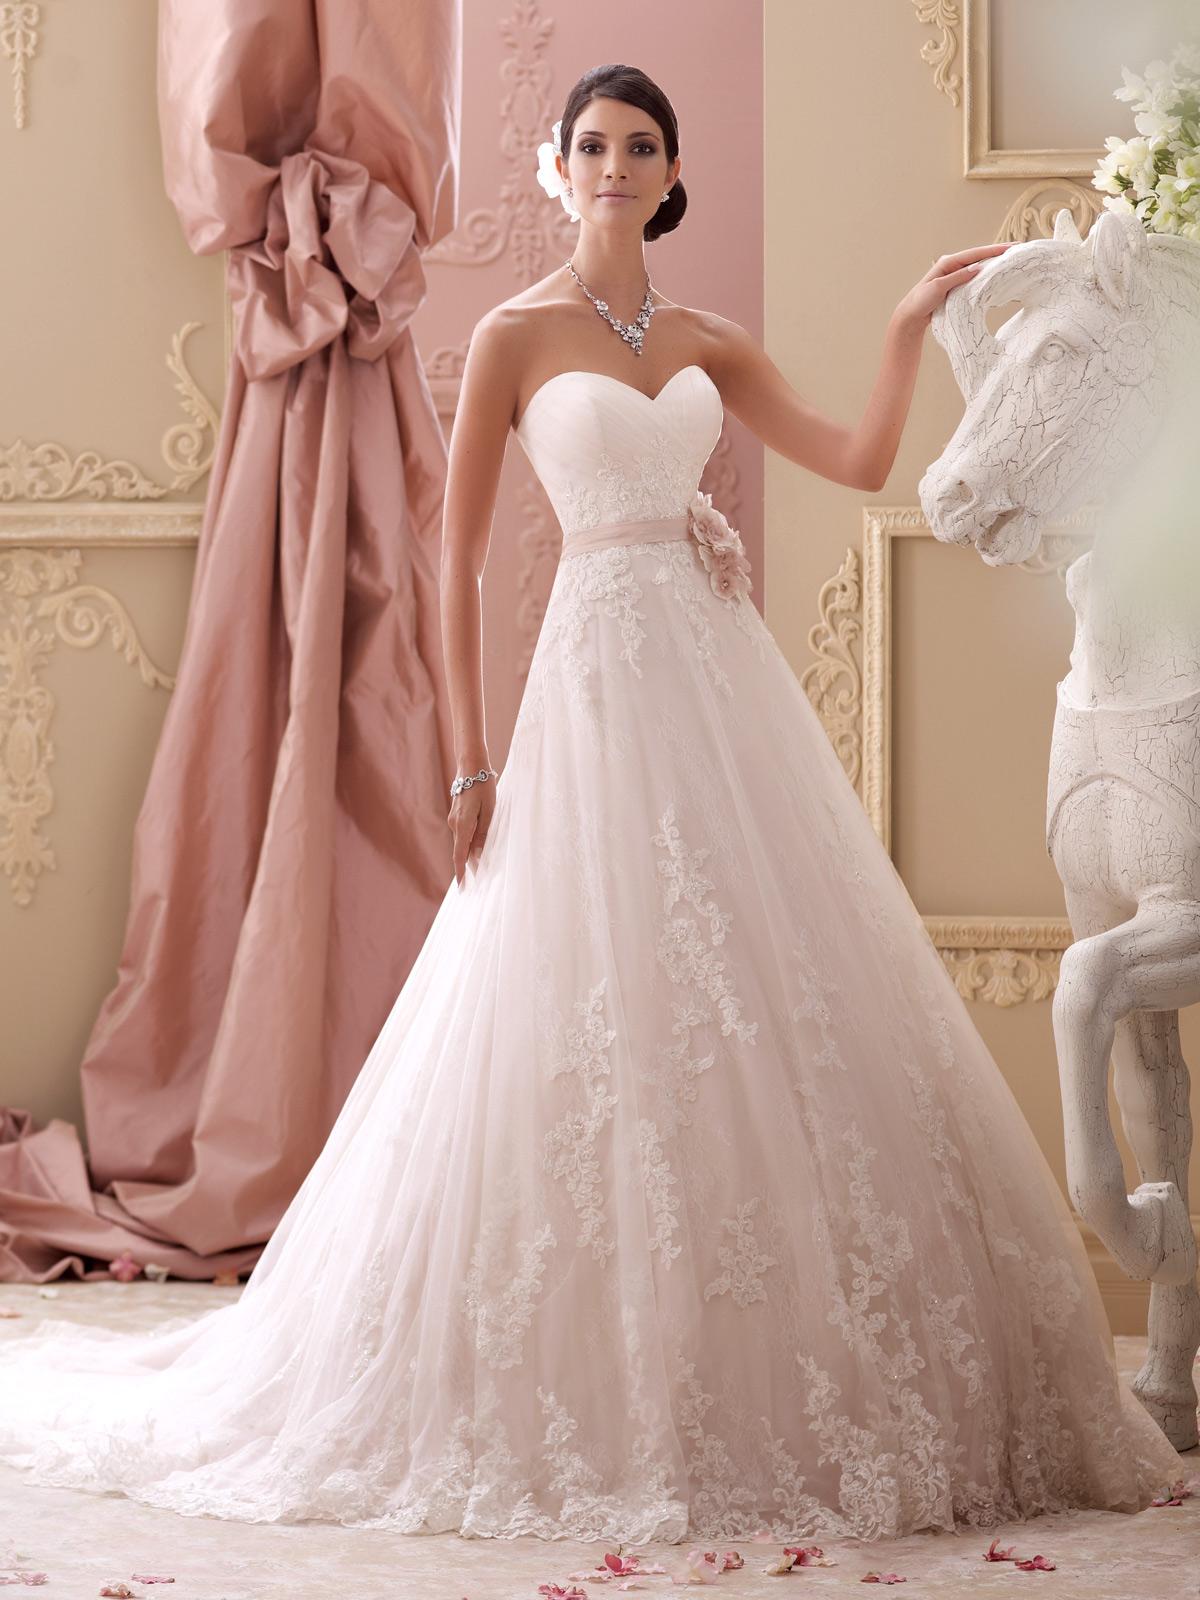 dress help please provide some clarity wedding dress